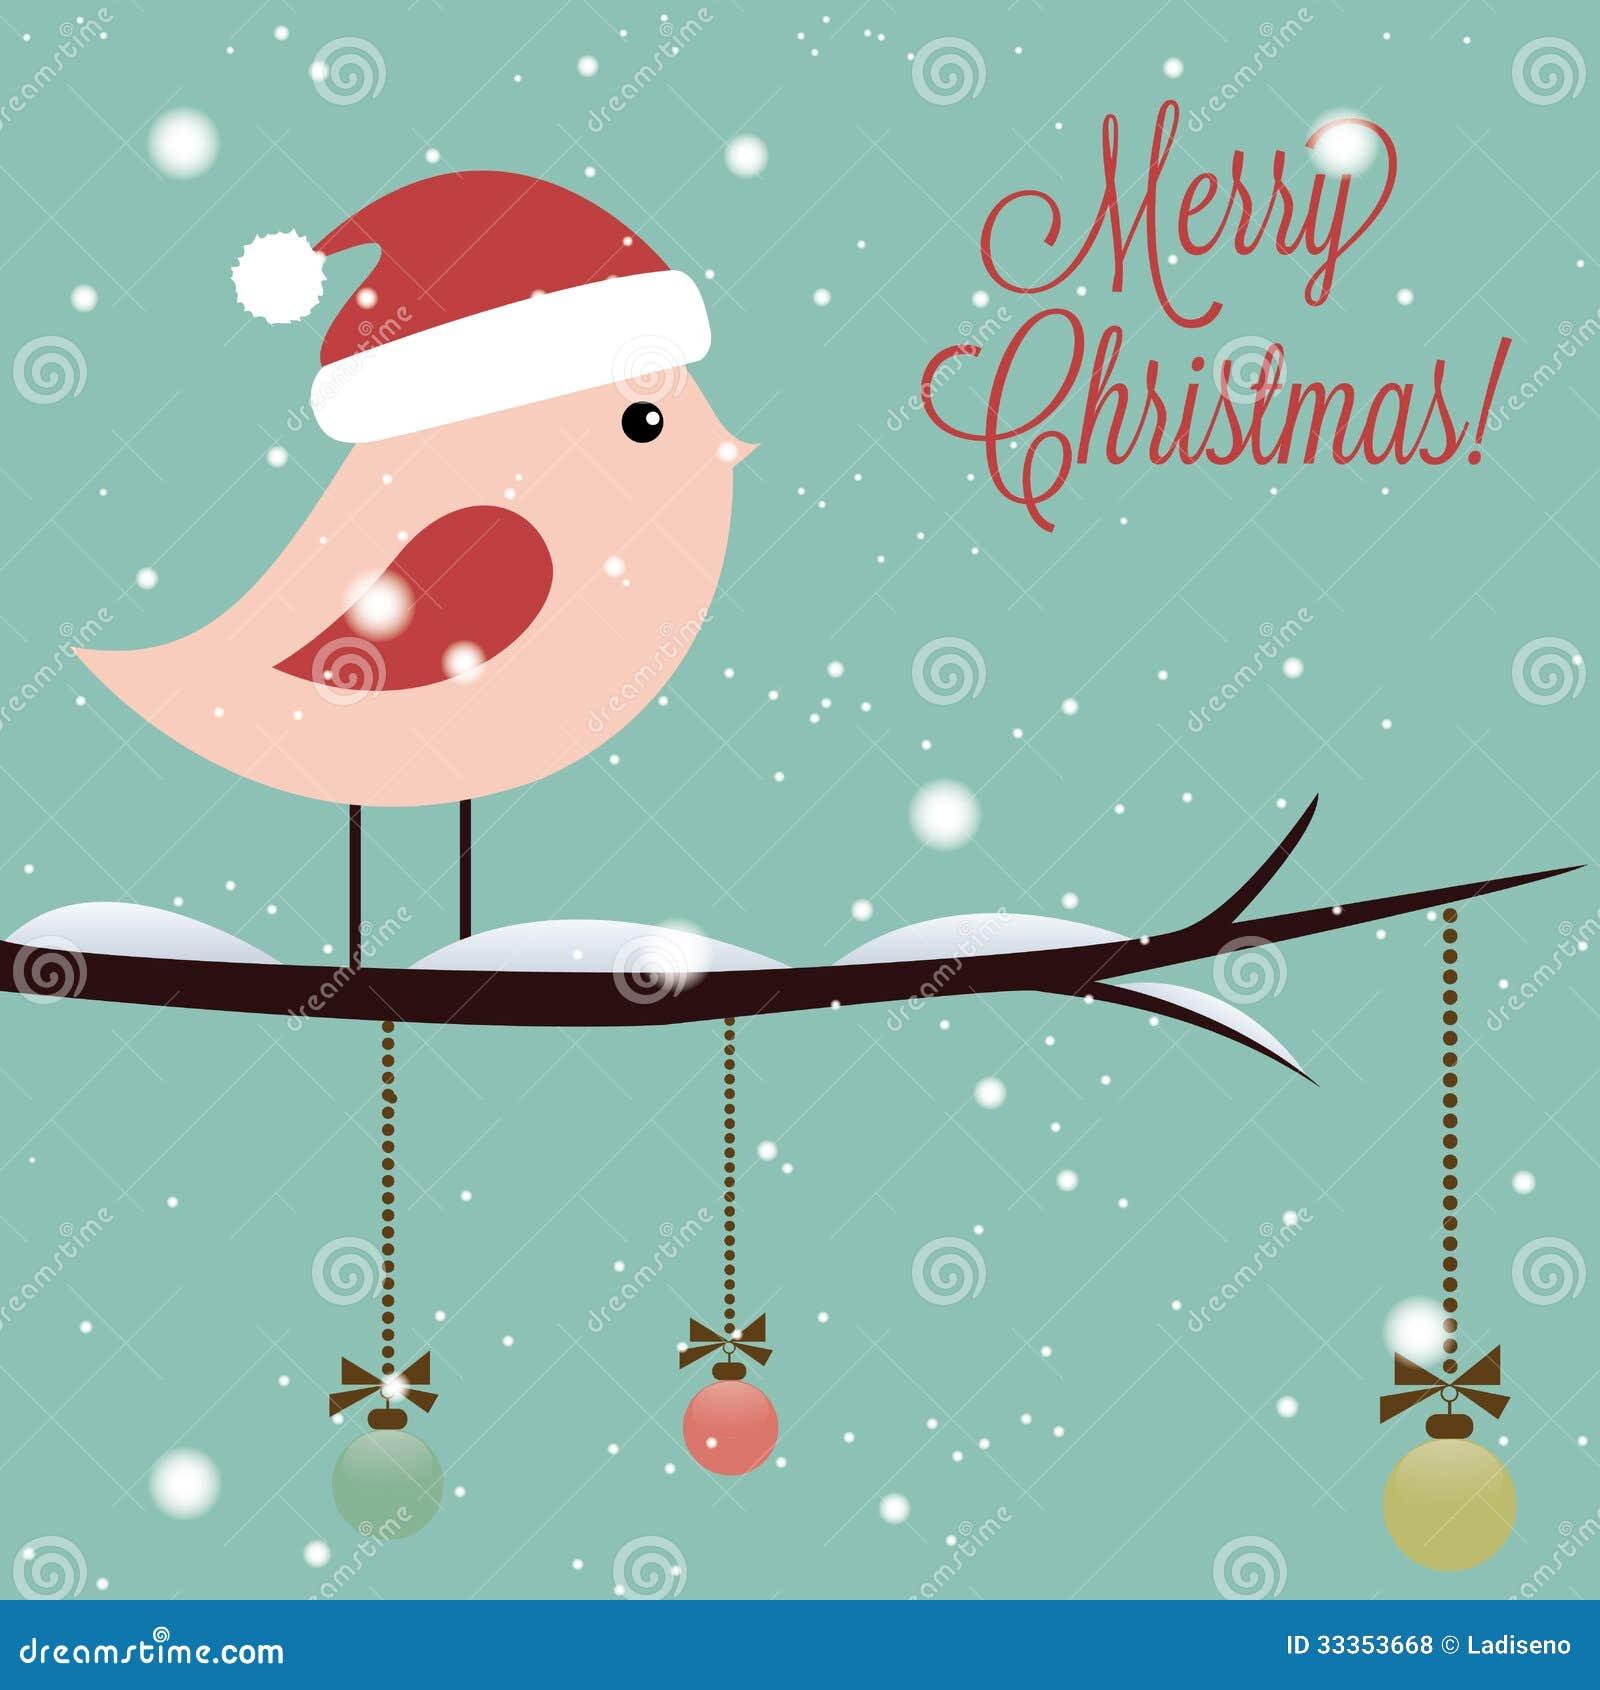 Merry Christmas stock vector. Illustration of banner - 33353668